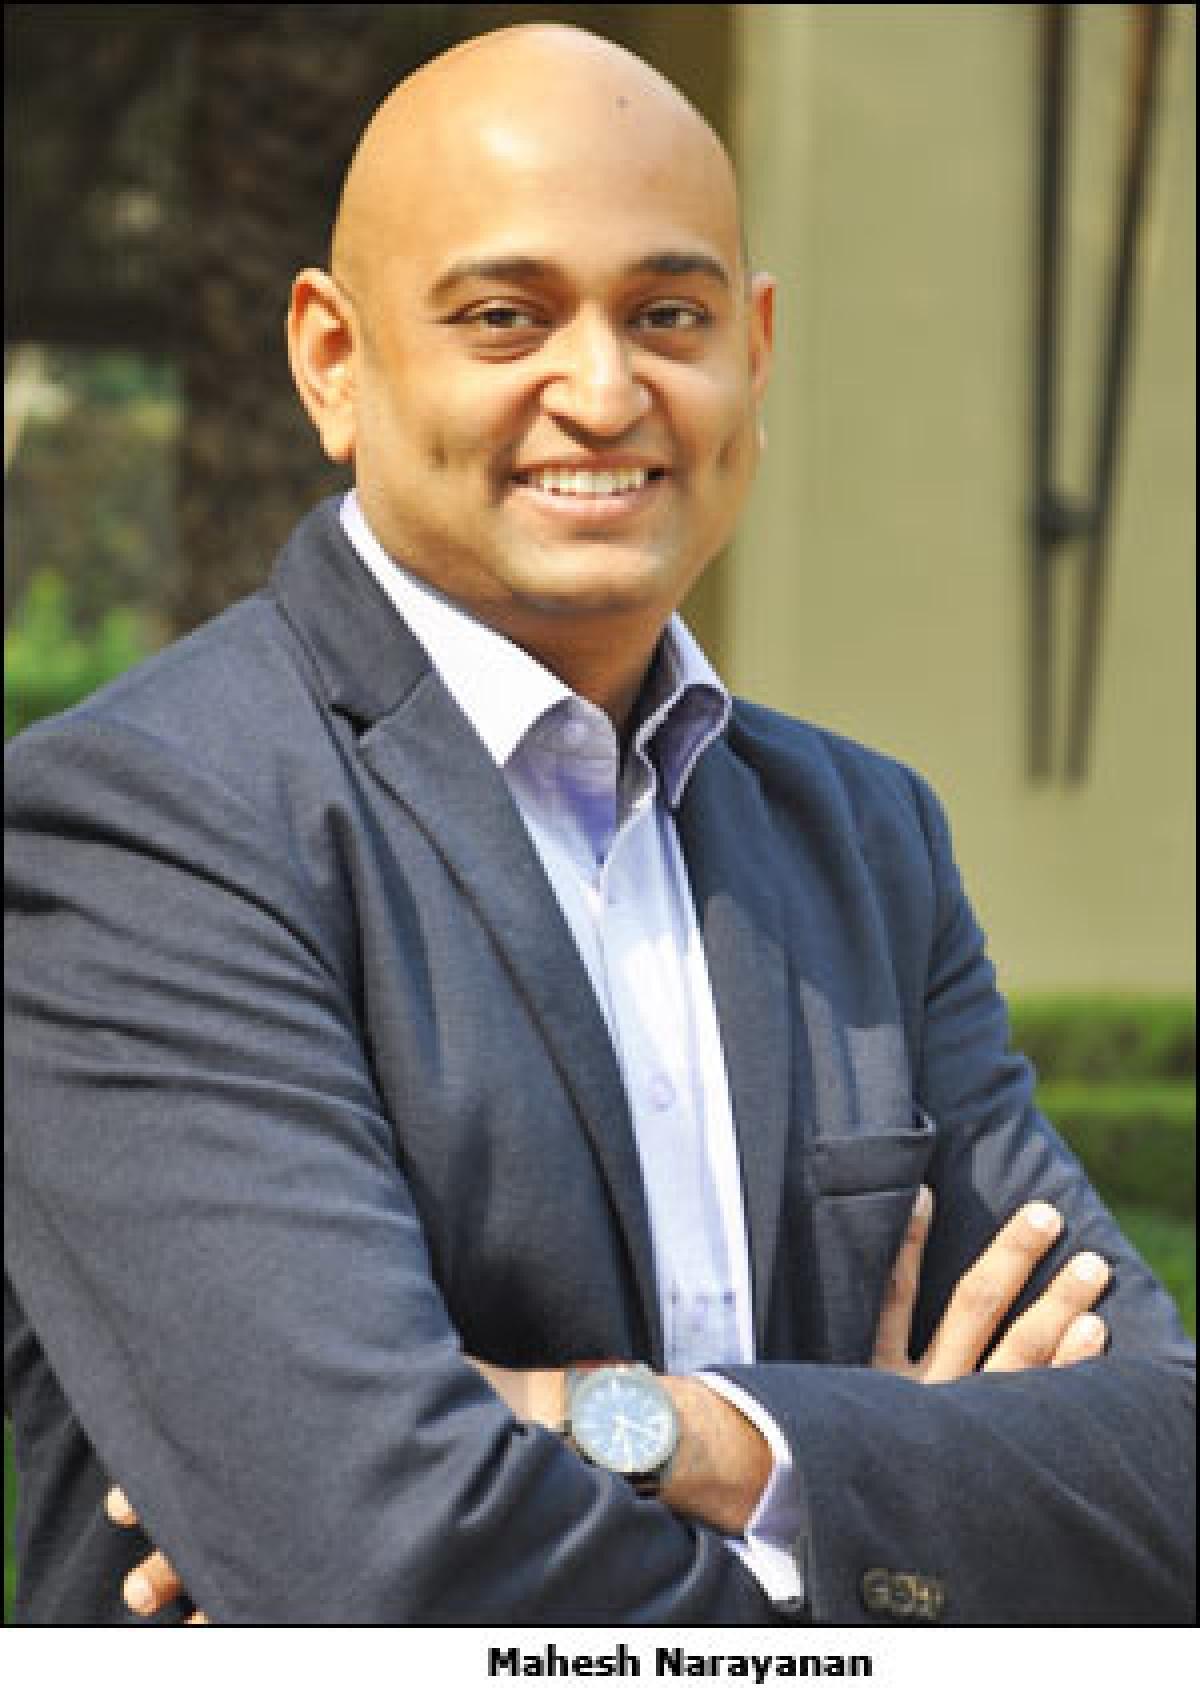 Profile: Mahesh Narayanan: Ahead of the Curve